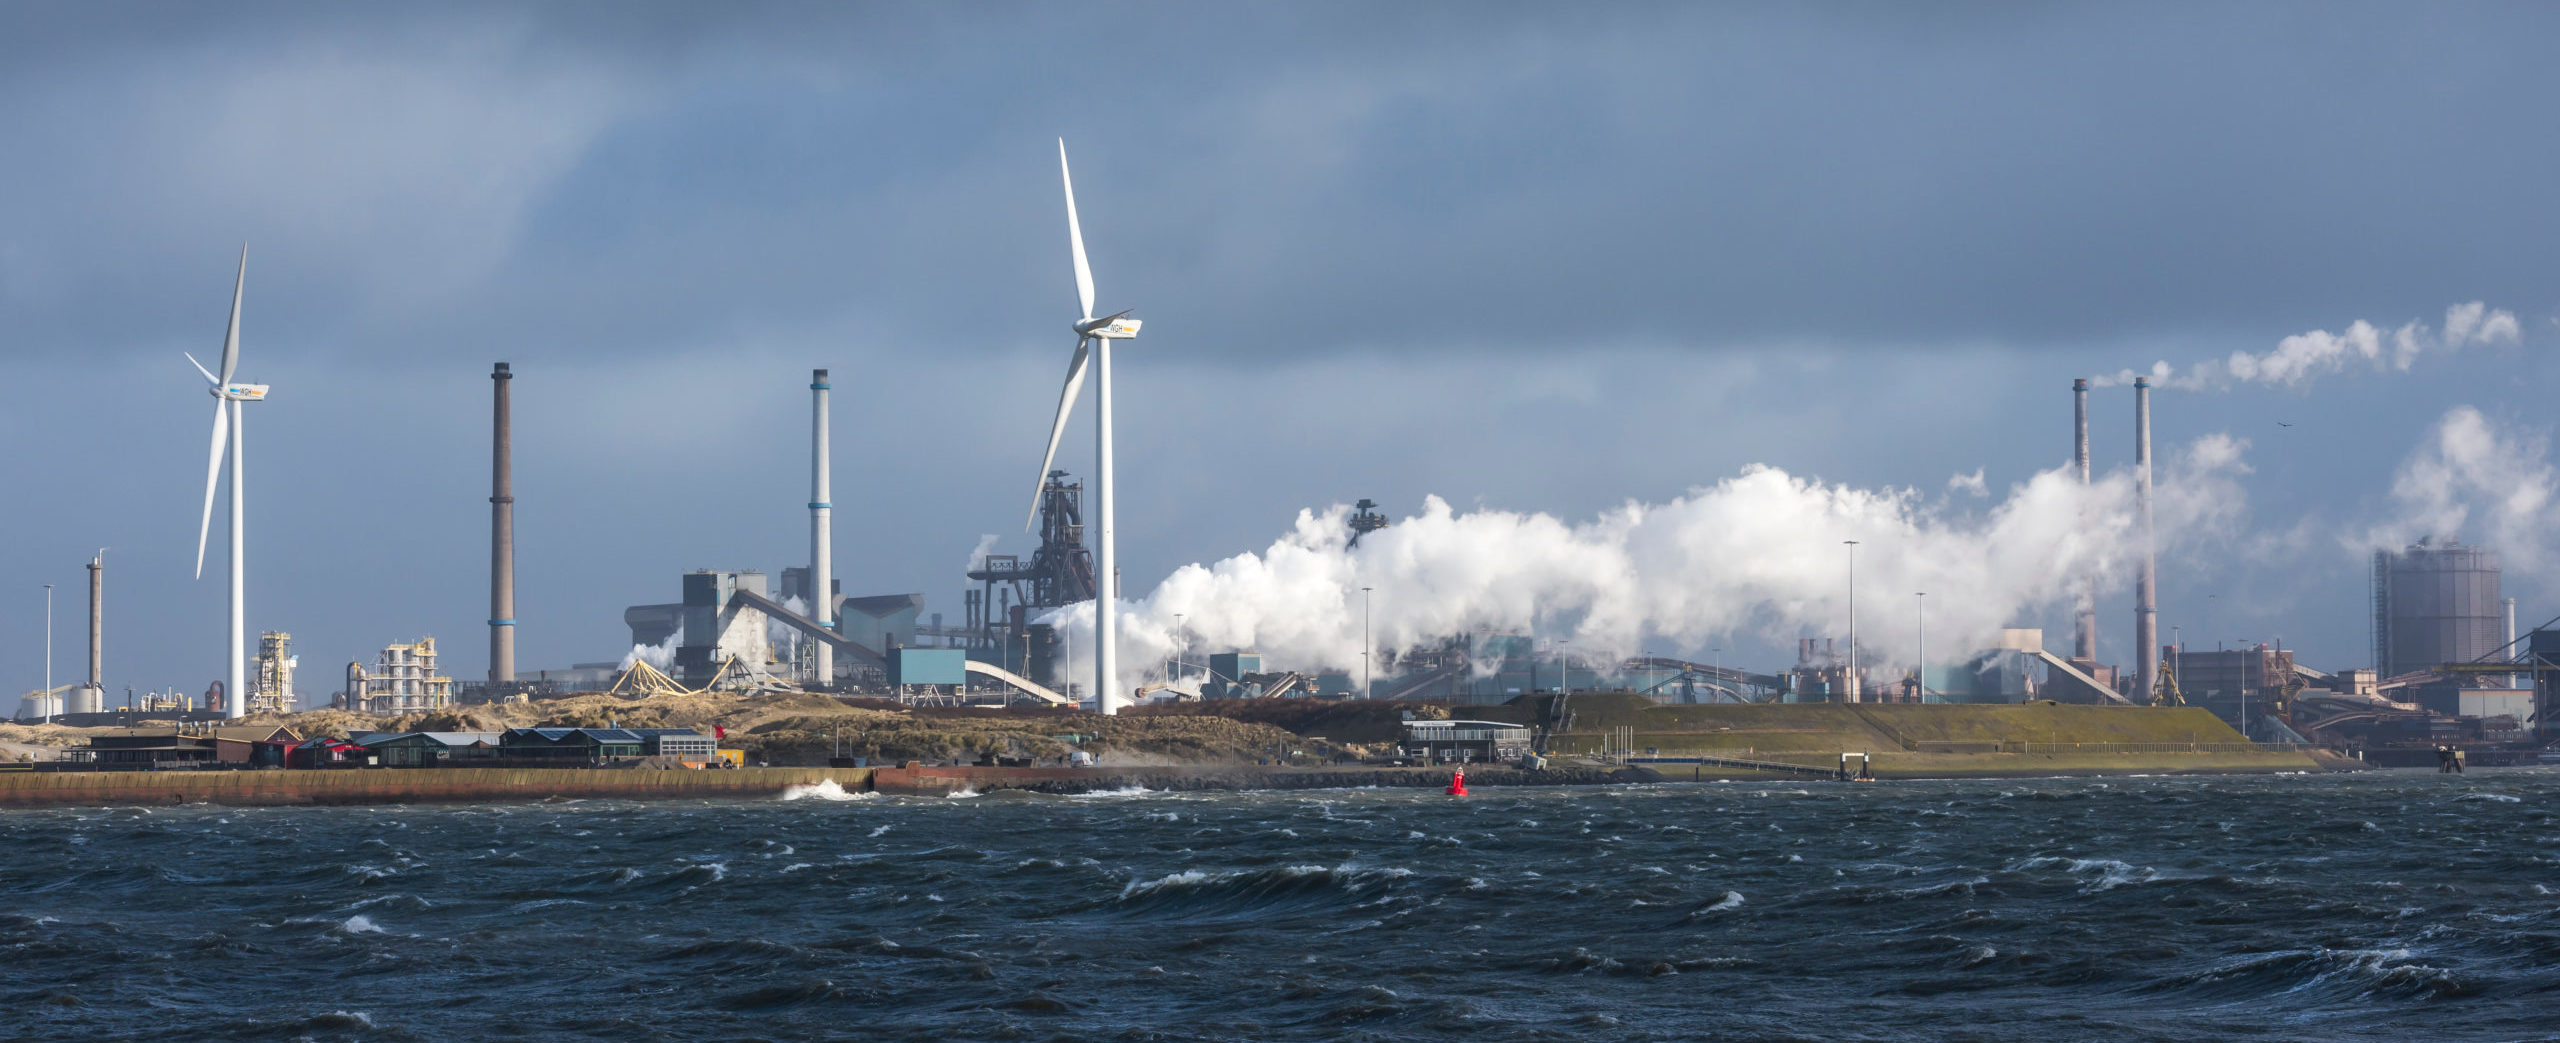 Vervuilende industrie